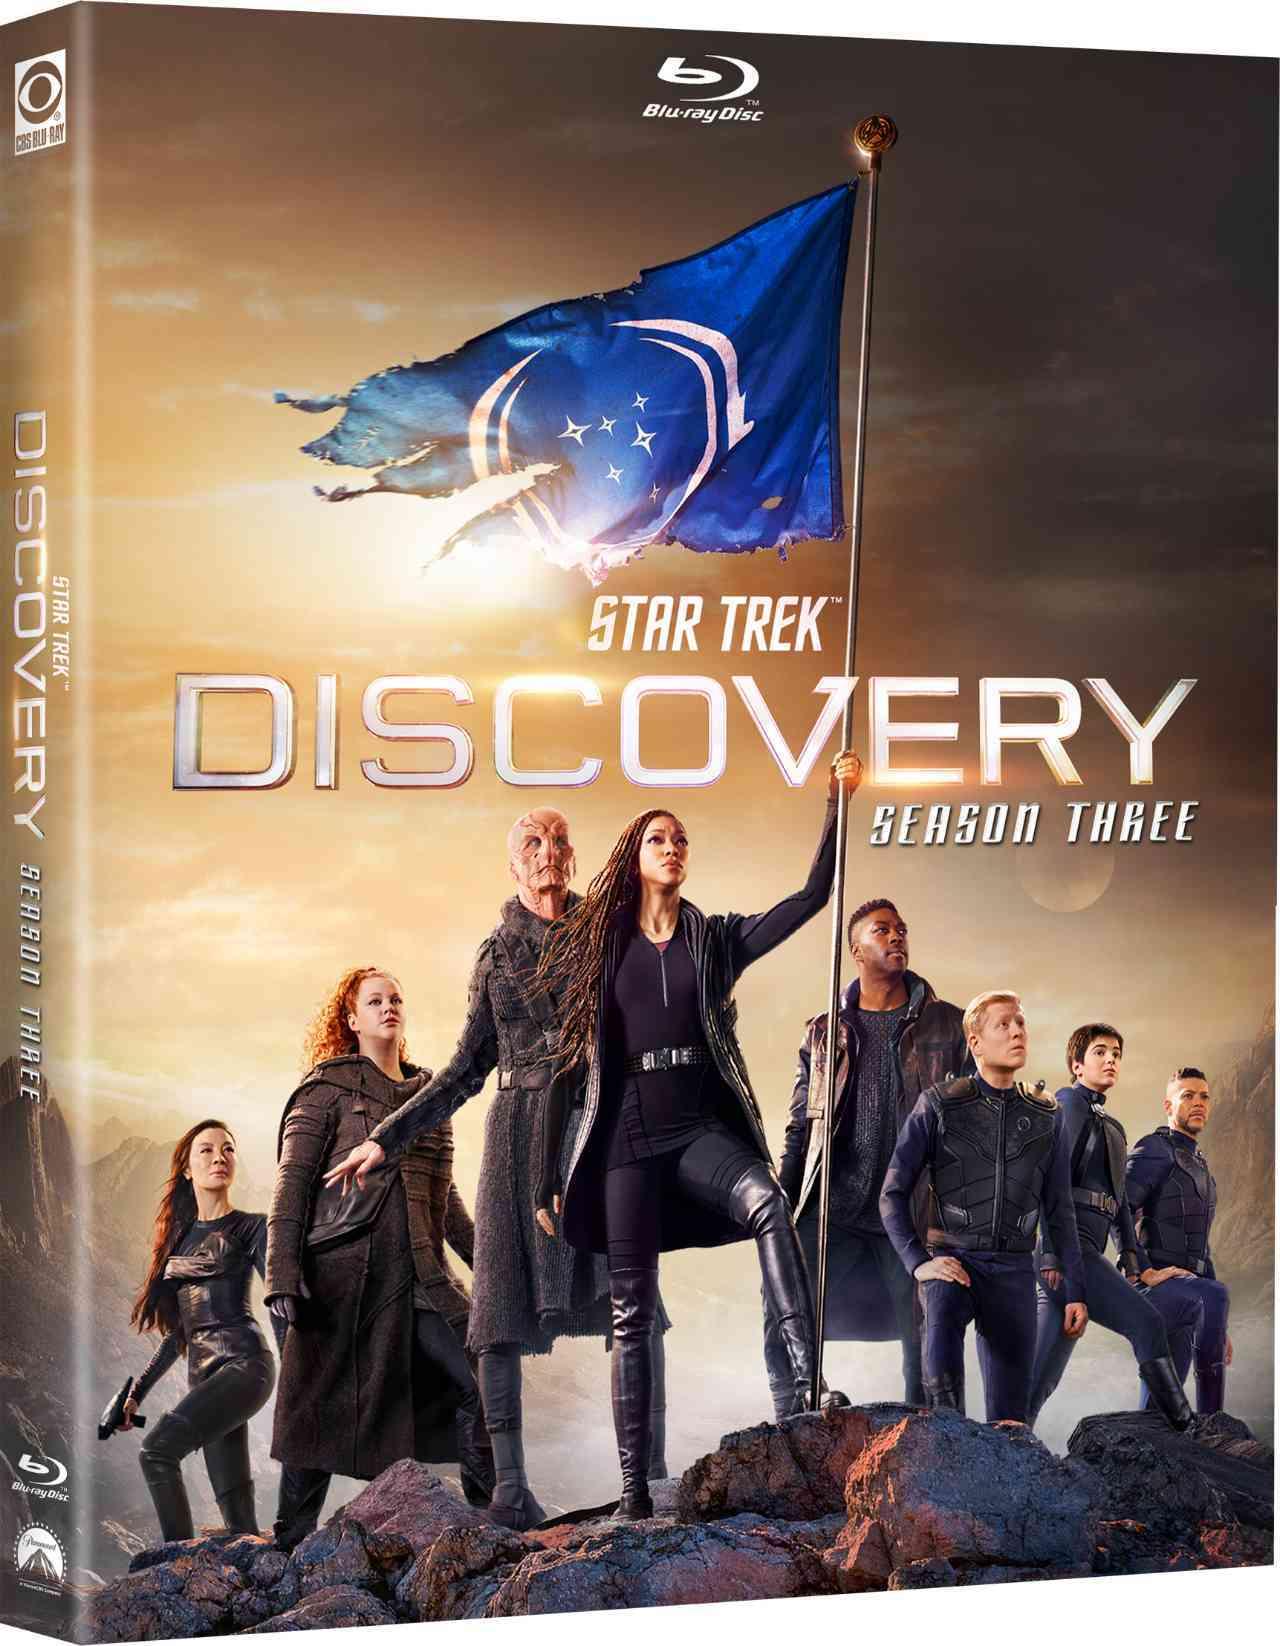 Star Trek Discovery S3_3D Blu-ray